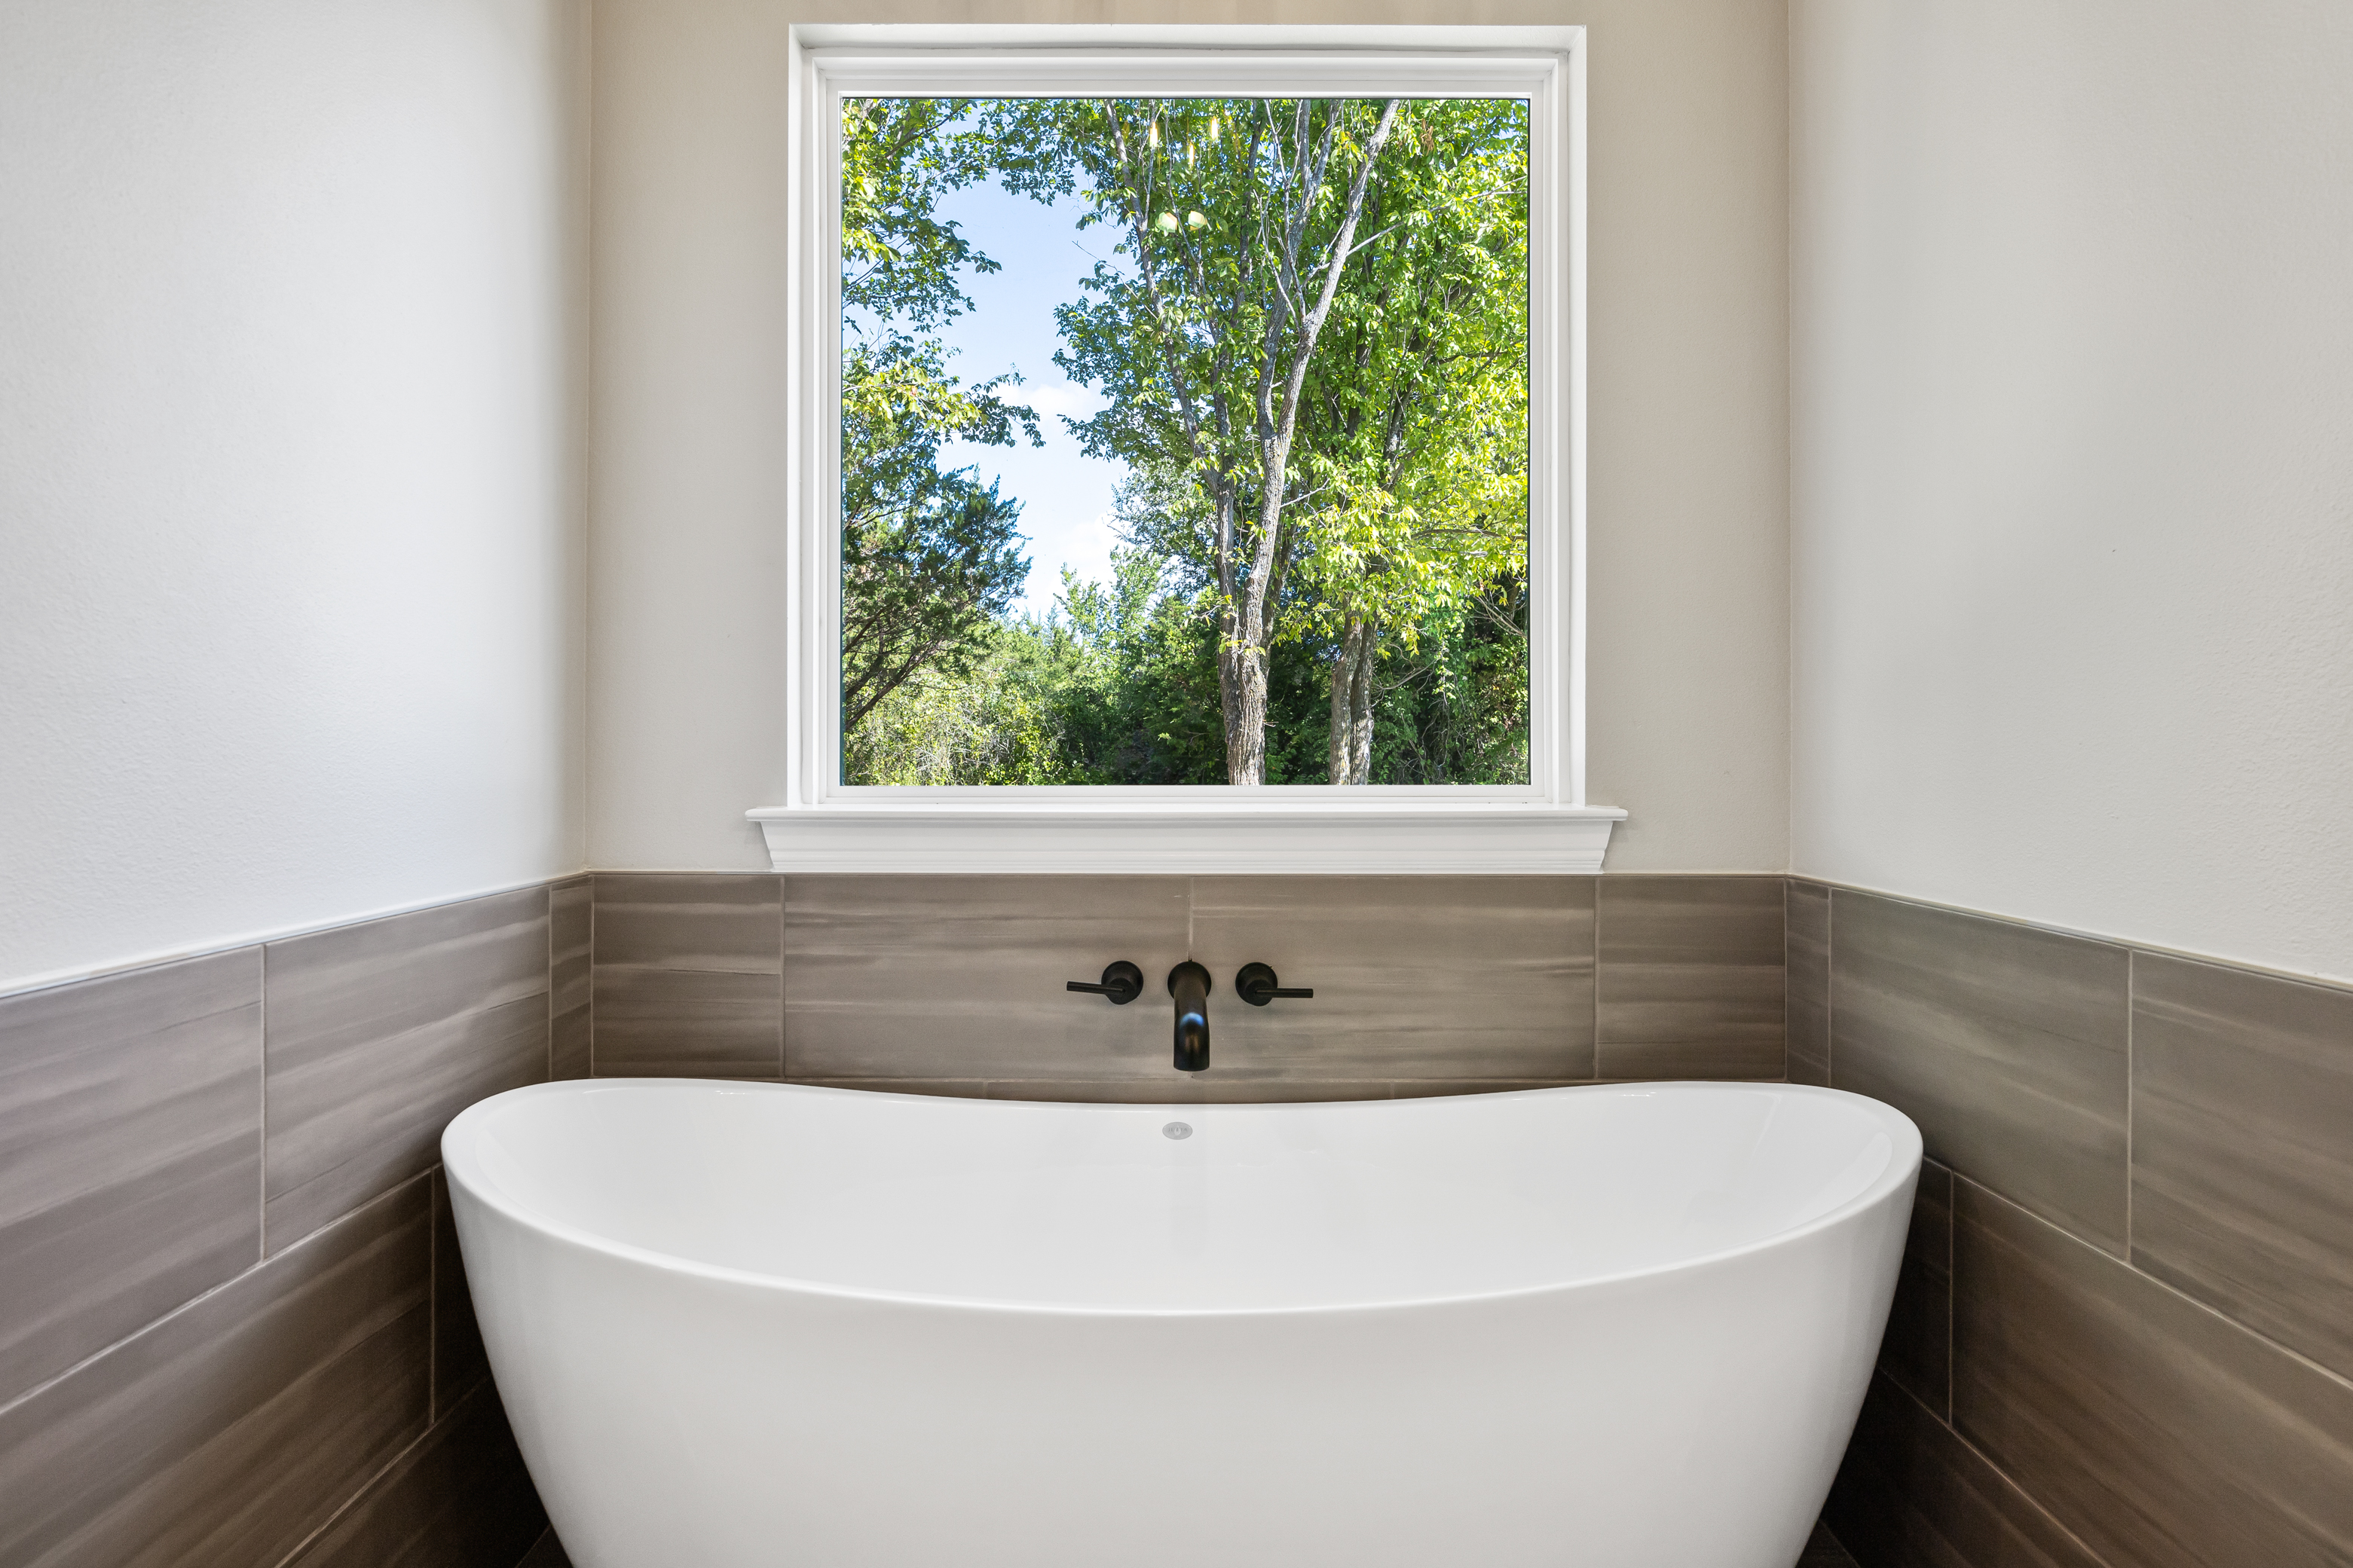 https://0201.nccdn.net/4_2/000/000/010/19b/master-bathtub.jpg